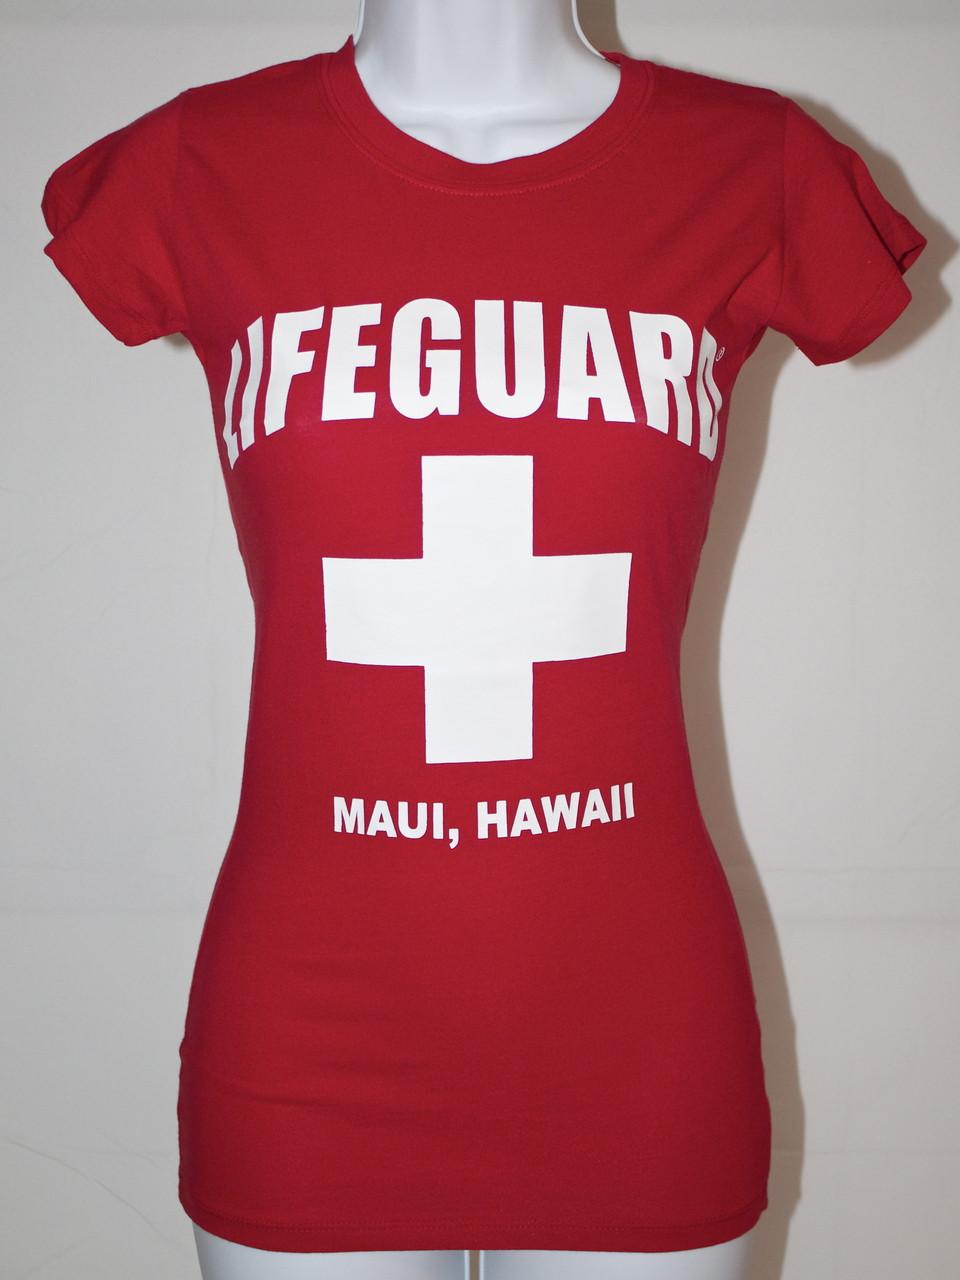 c30b946008ec Women's Junior Baby-Doll Lifeguard T- Shirt in Classic Red - (808 ...